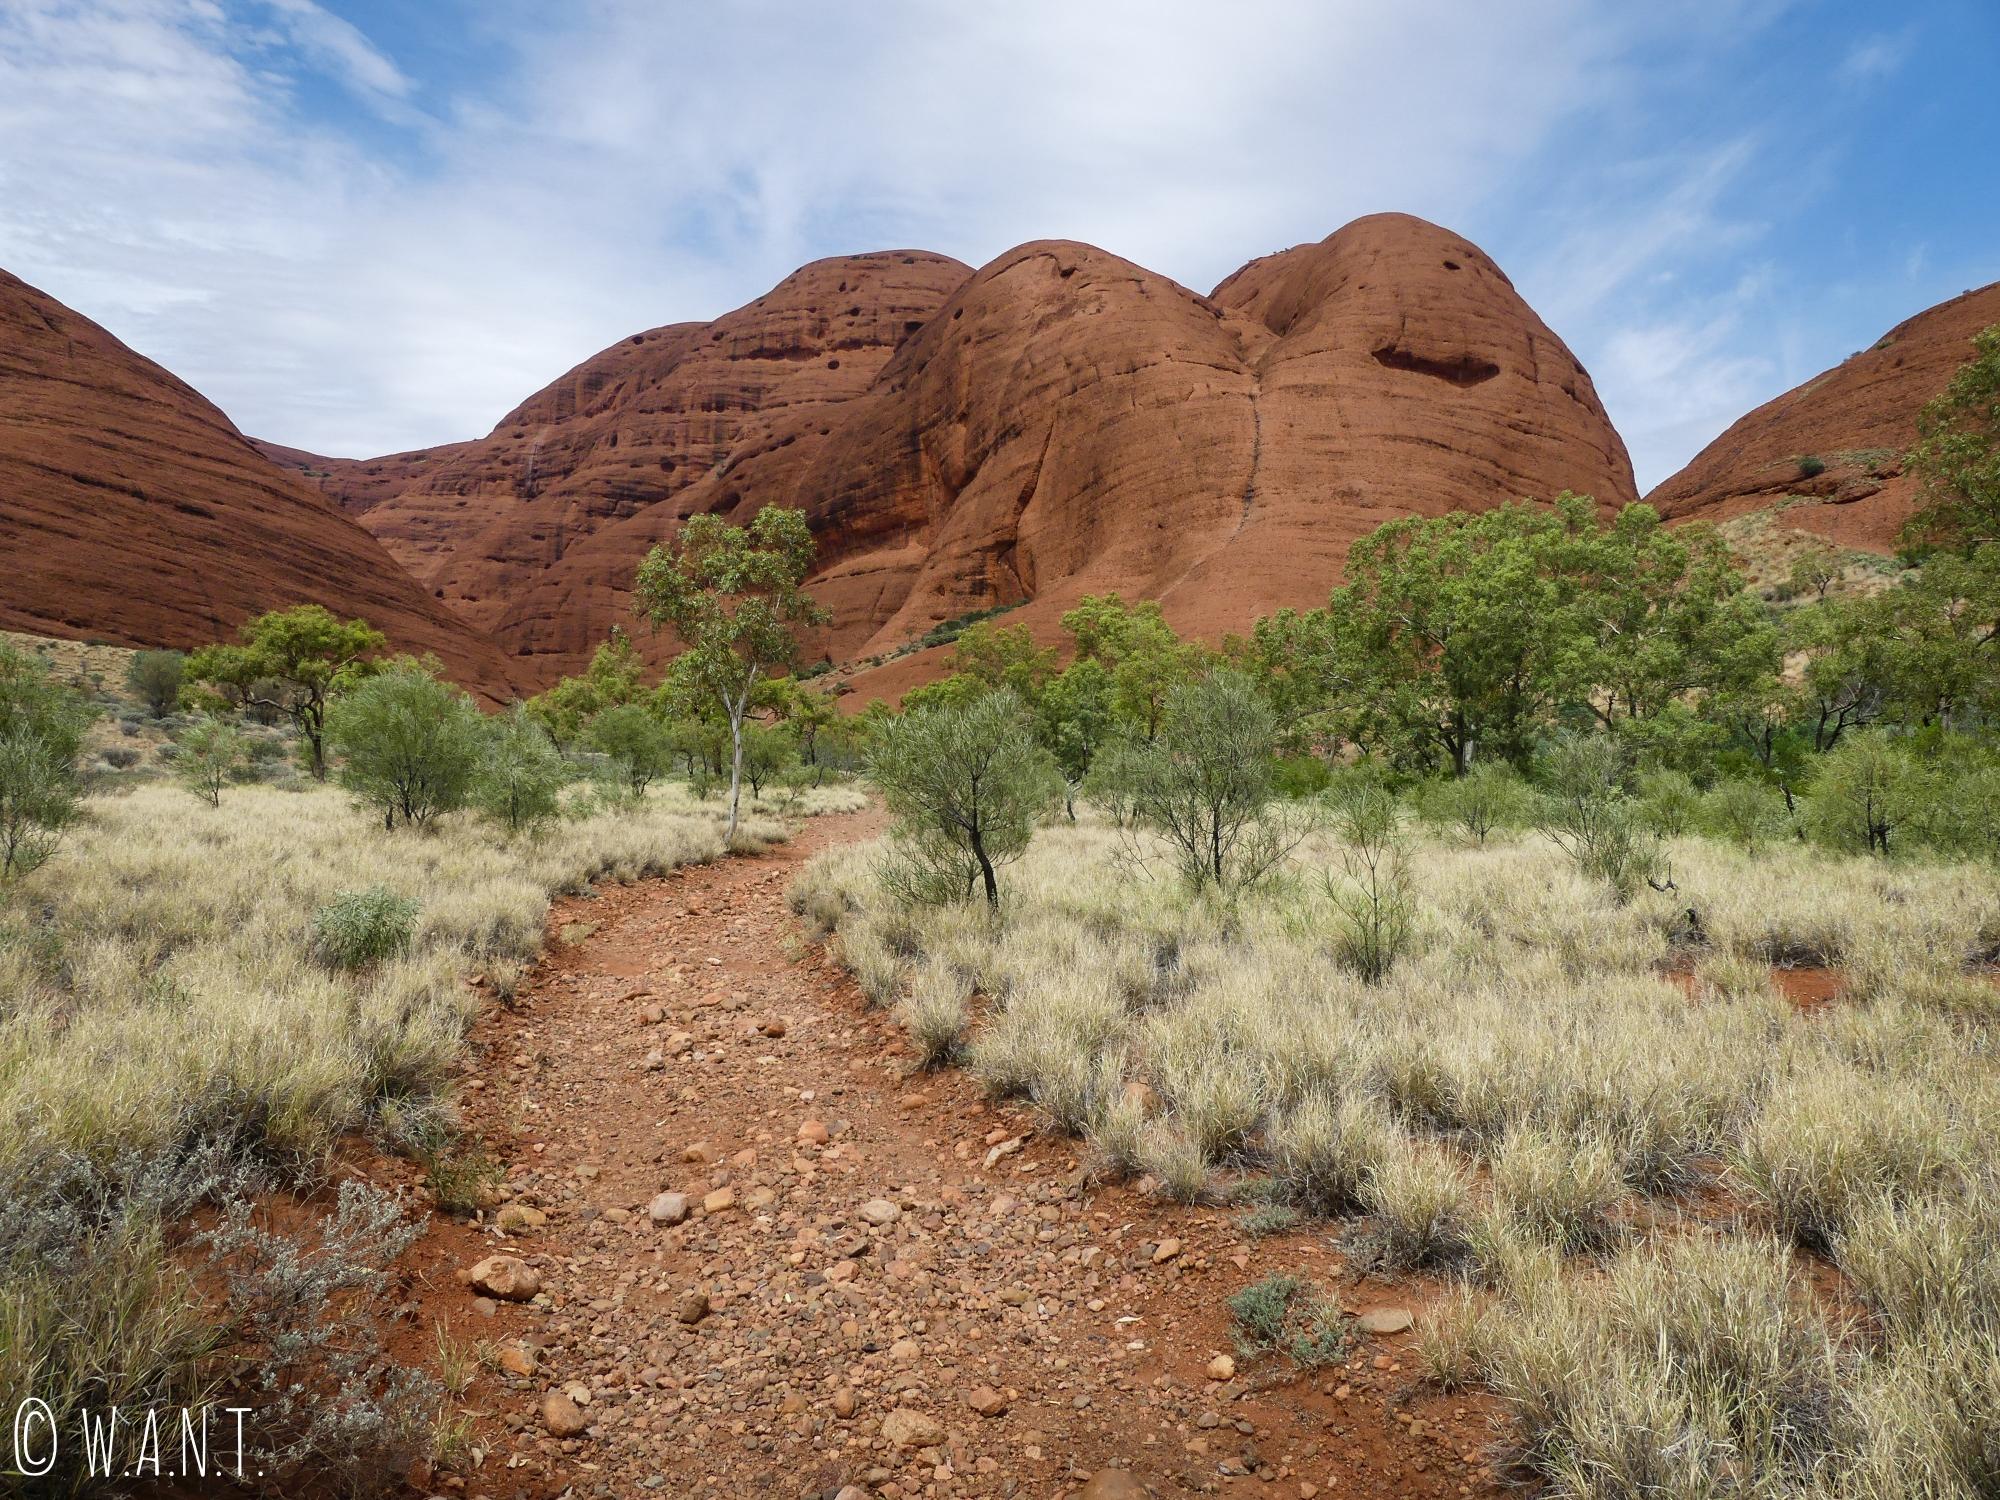 La randonnée Valley of the Winds Walk du parc national Uluru-Kata Tjuta nous fait traverser à travers les dômes du Kata Tjuta